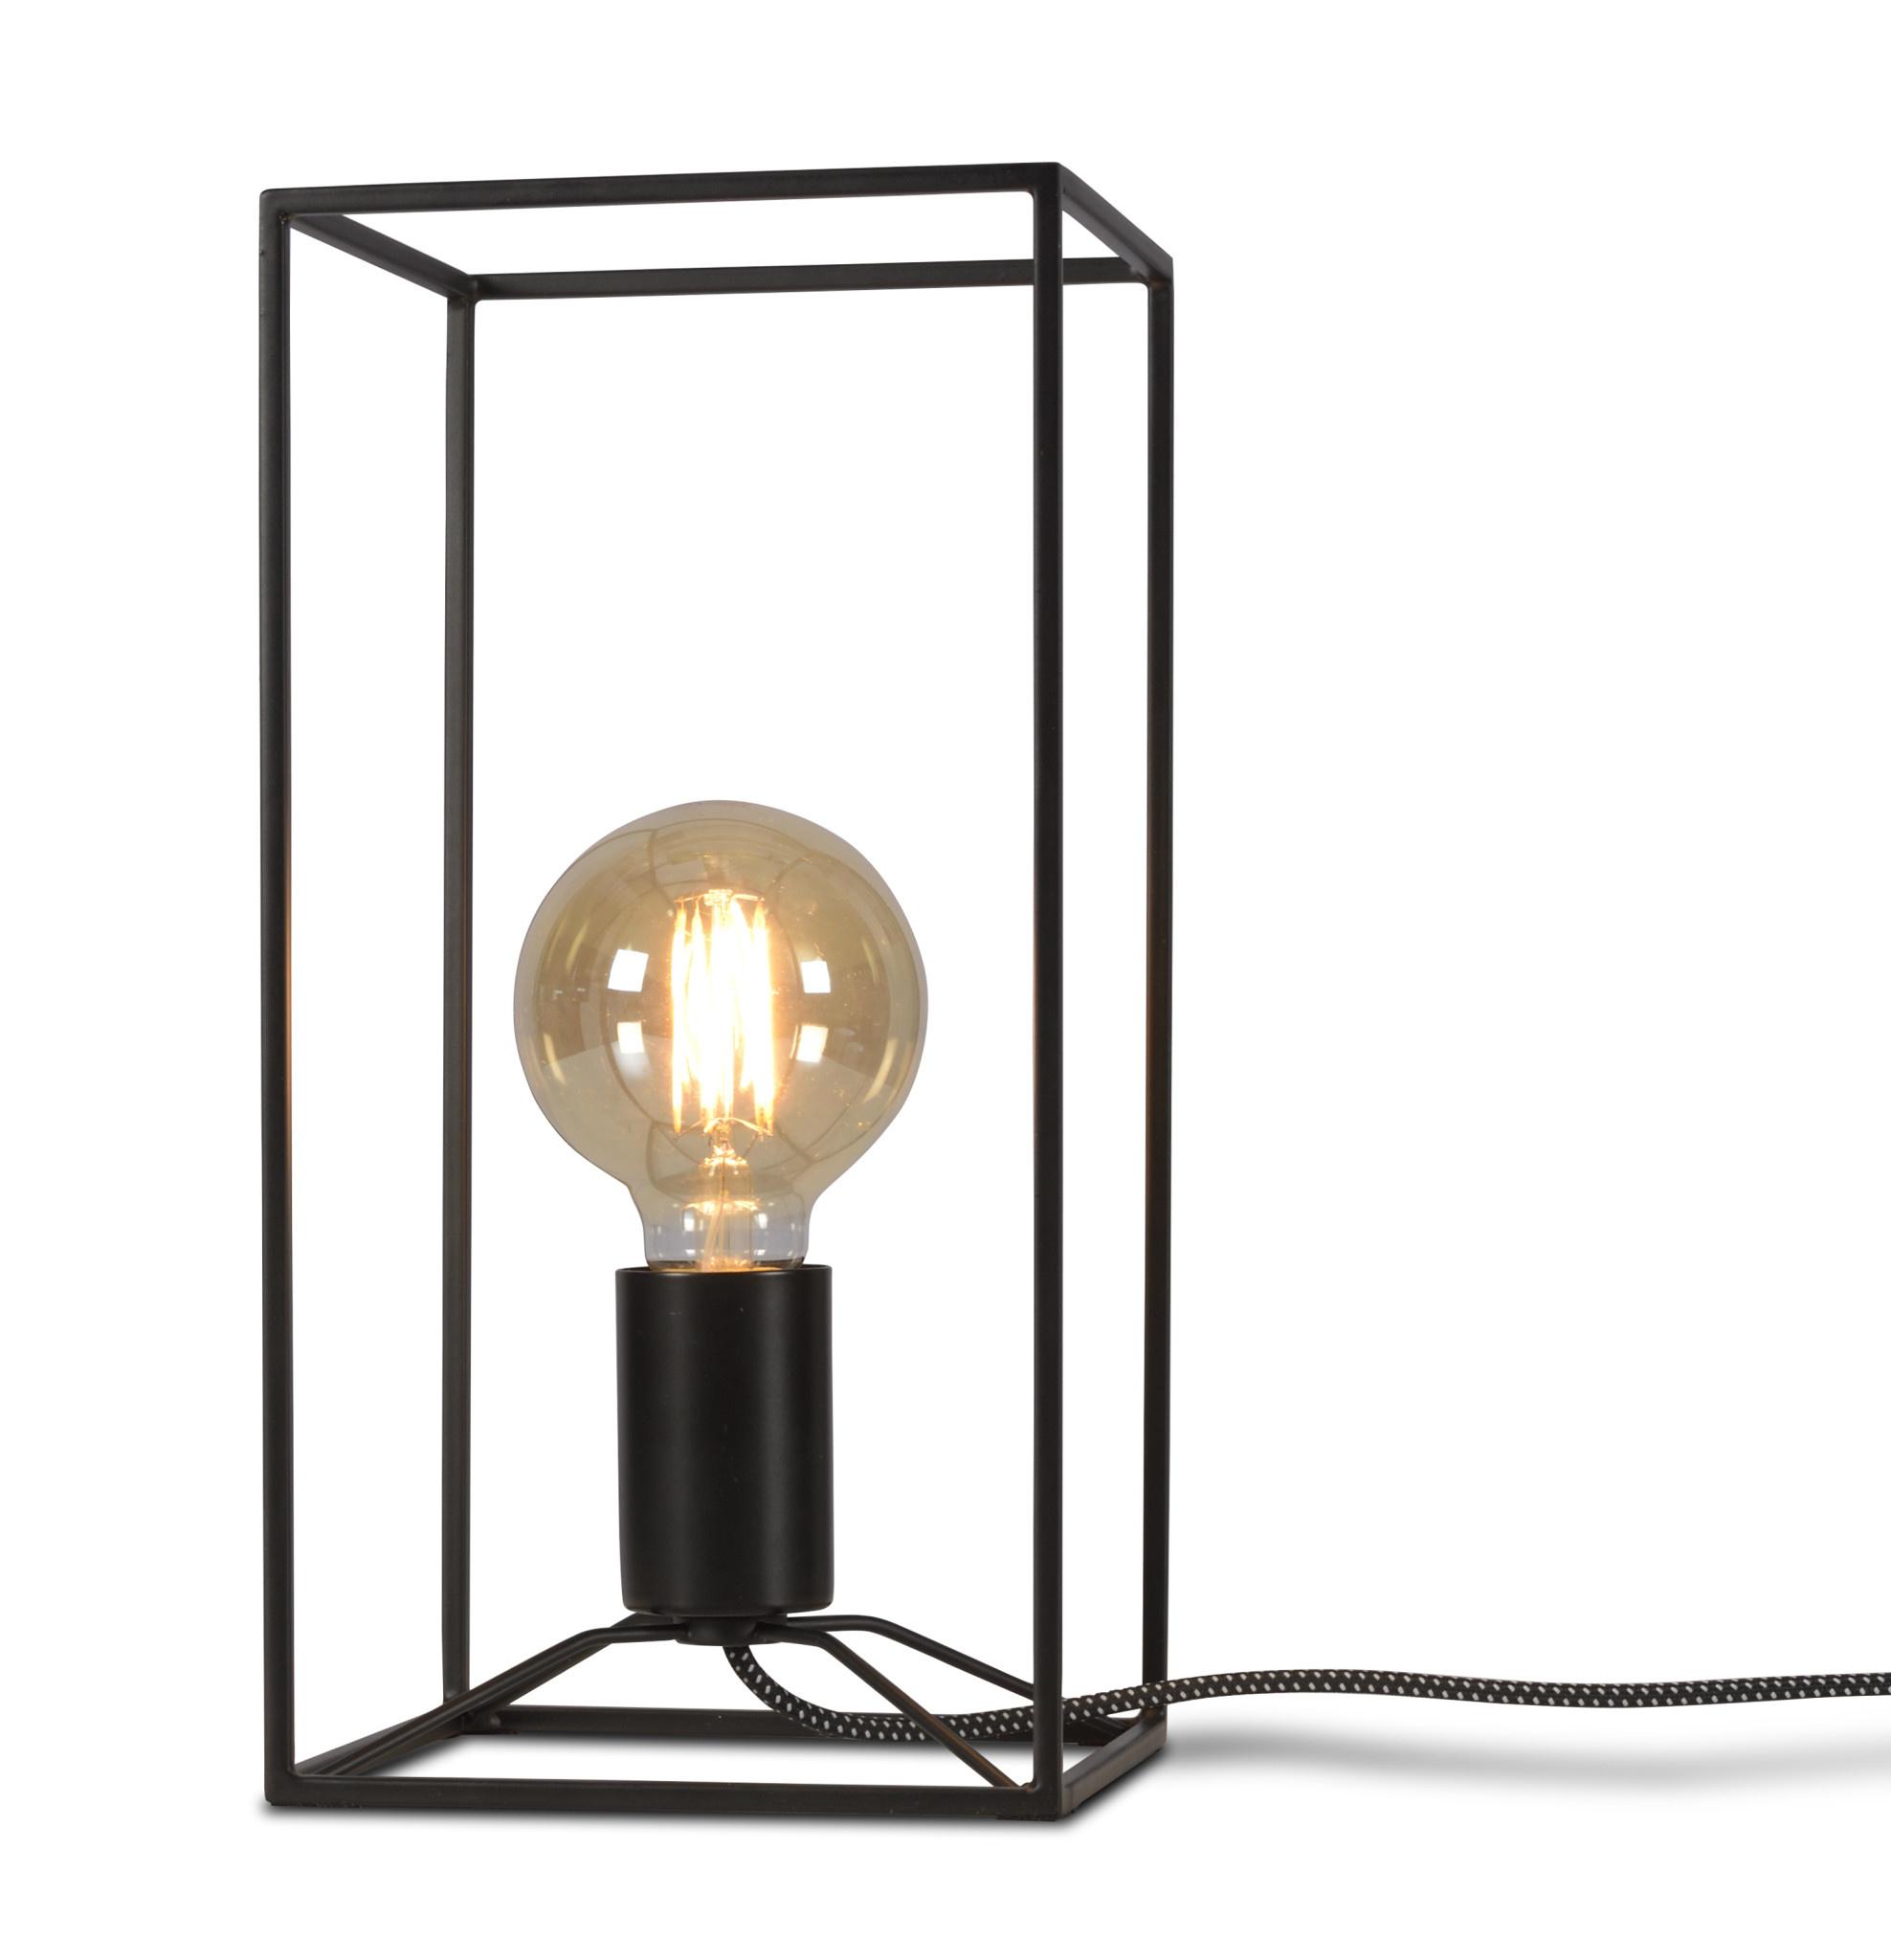 Tafellamp Antwerp rechthoek zwart-1